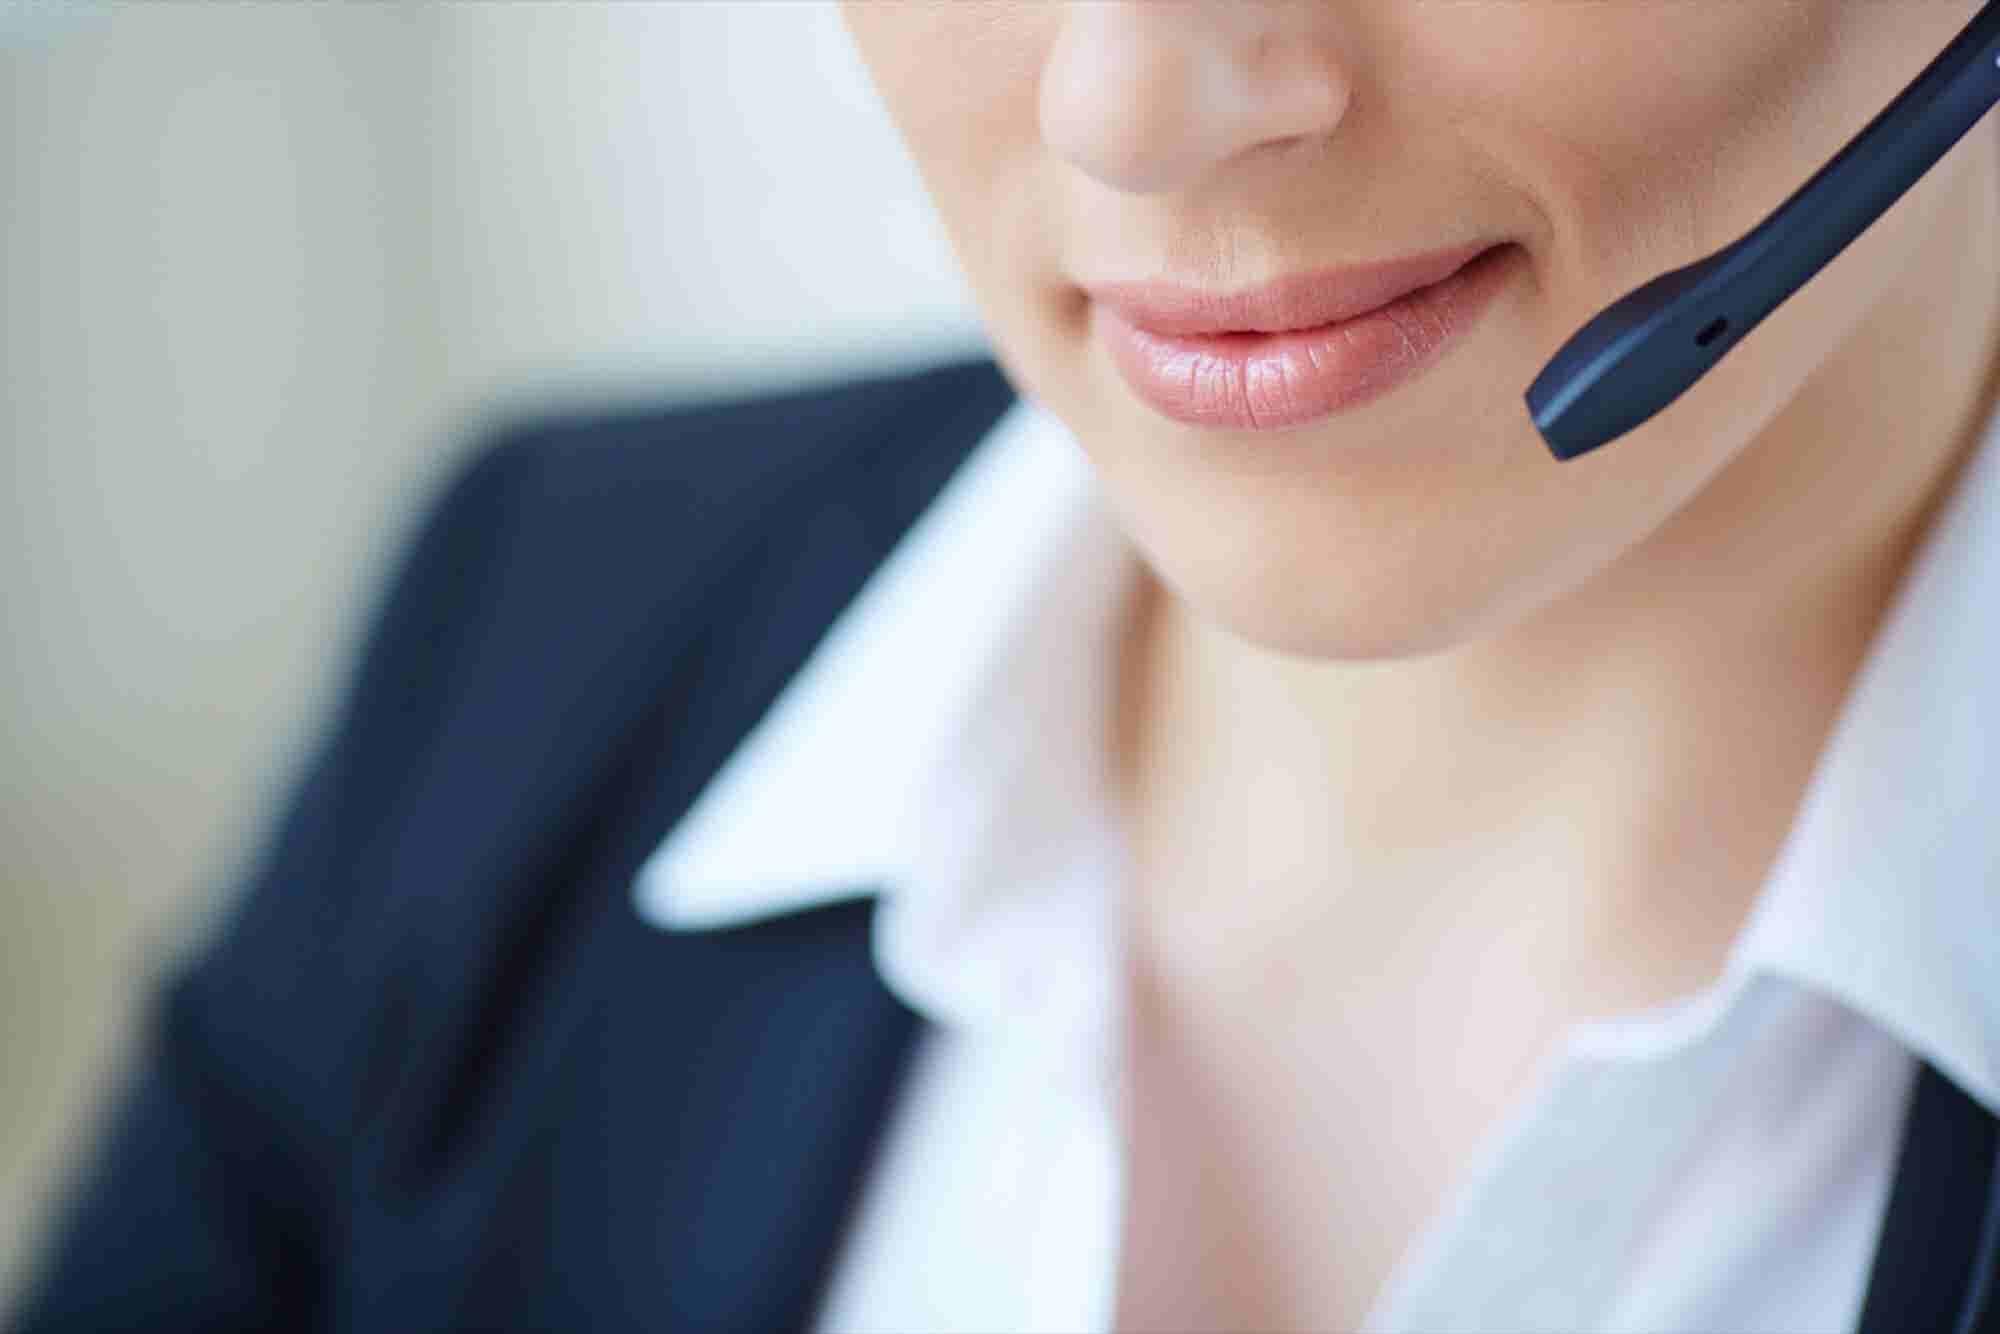 The How-To: Avoiding UAE Customer Service Pitfalls